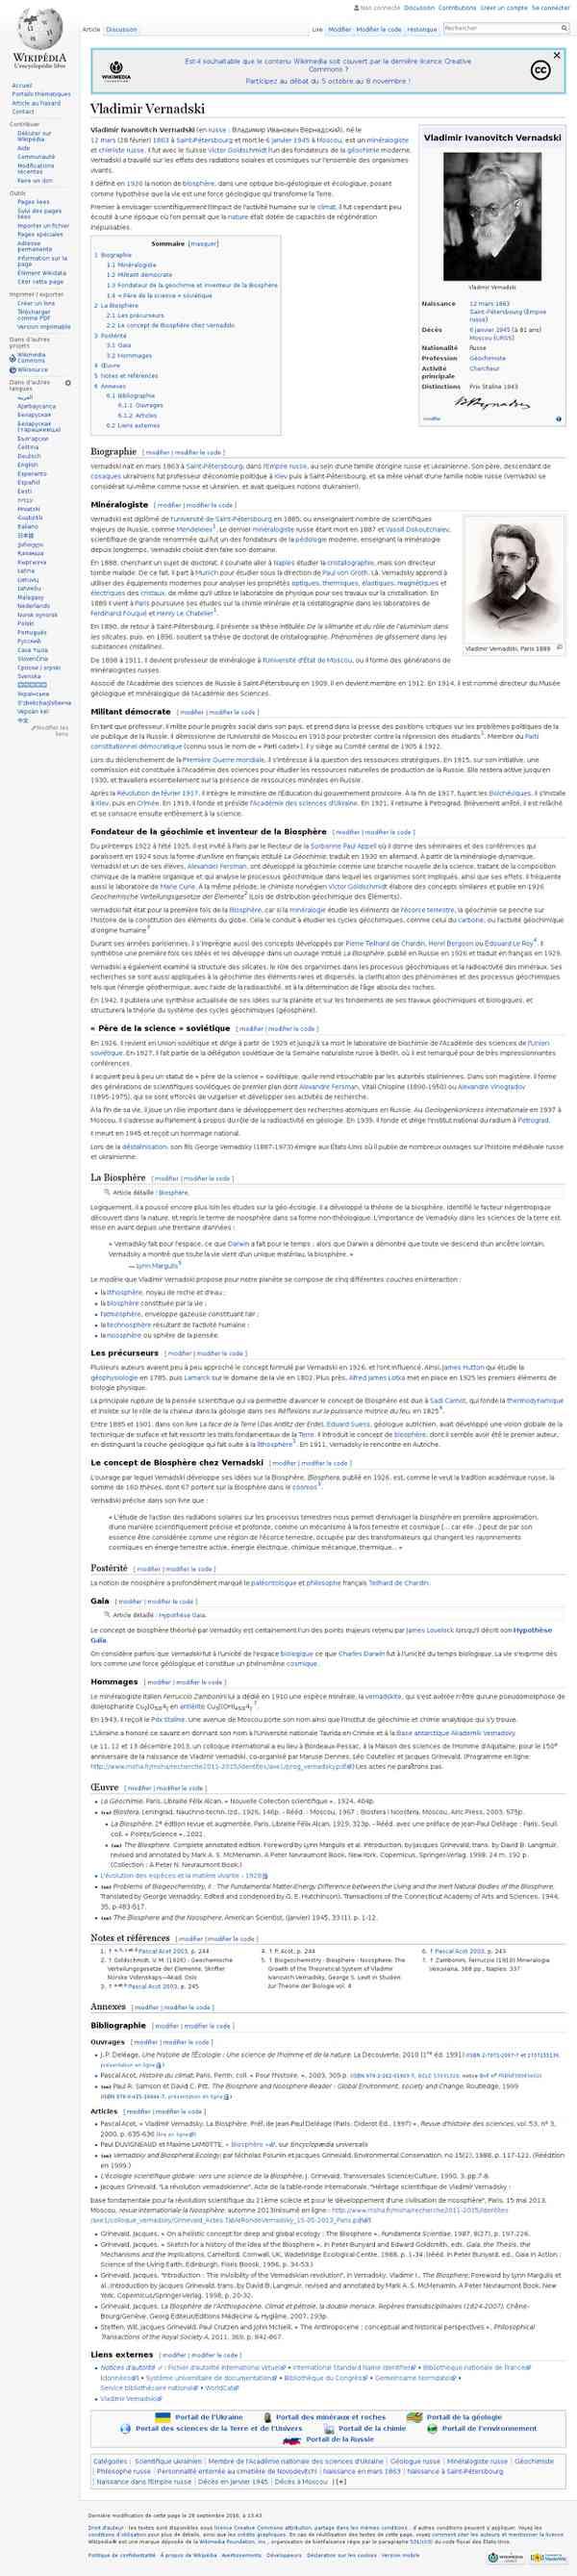 Vladimir Vernadski - Wikipédia